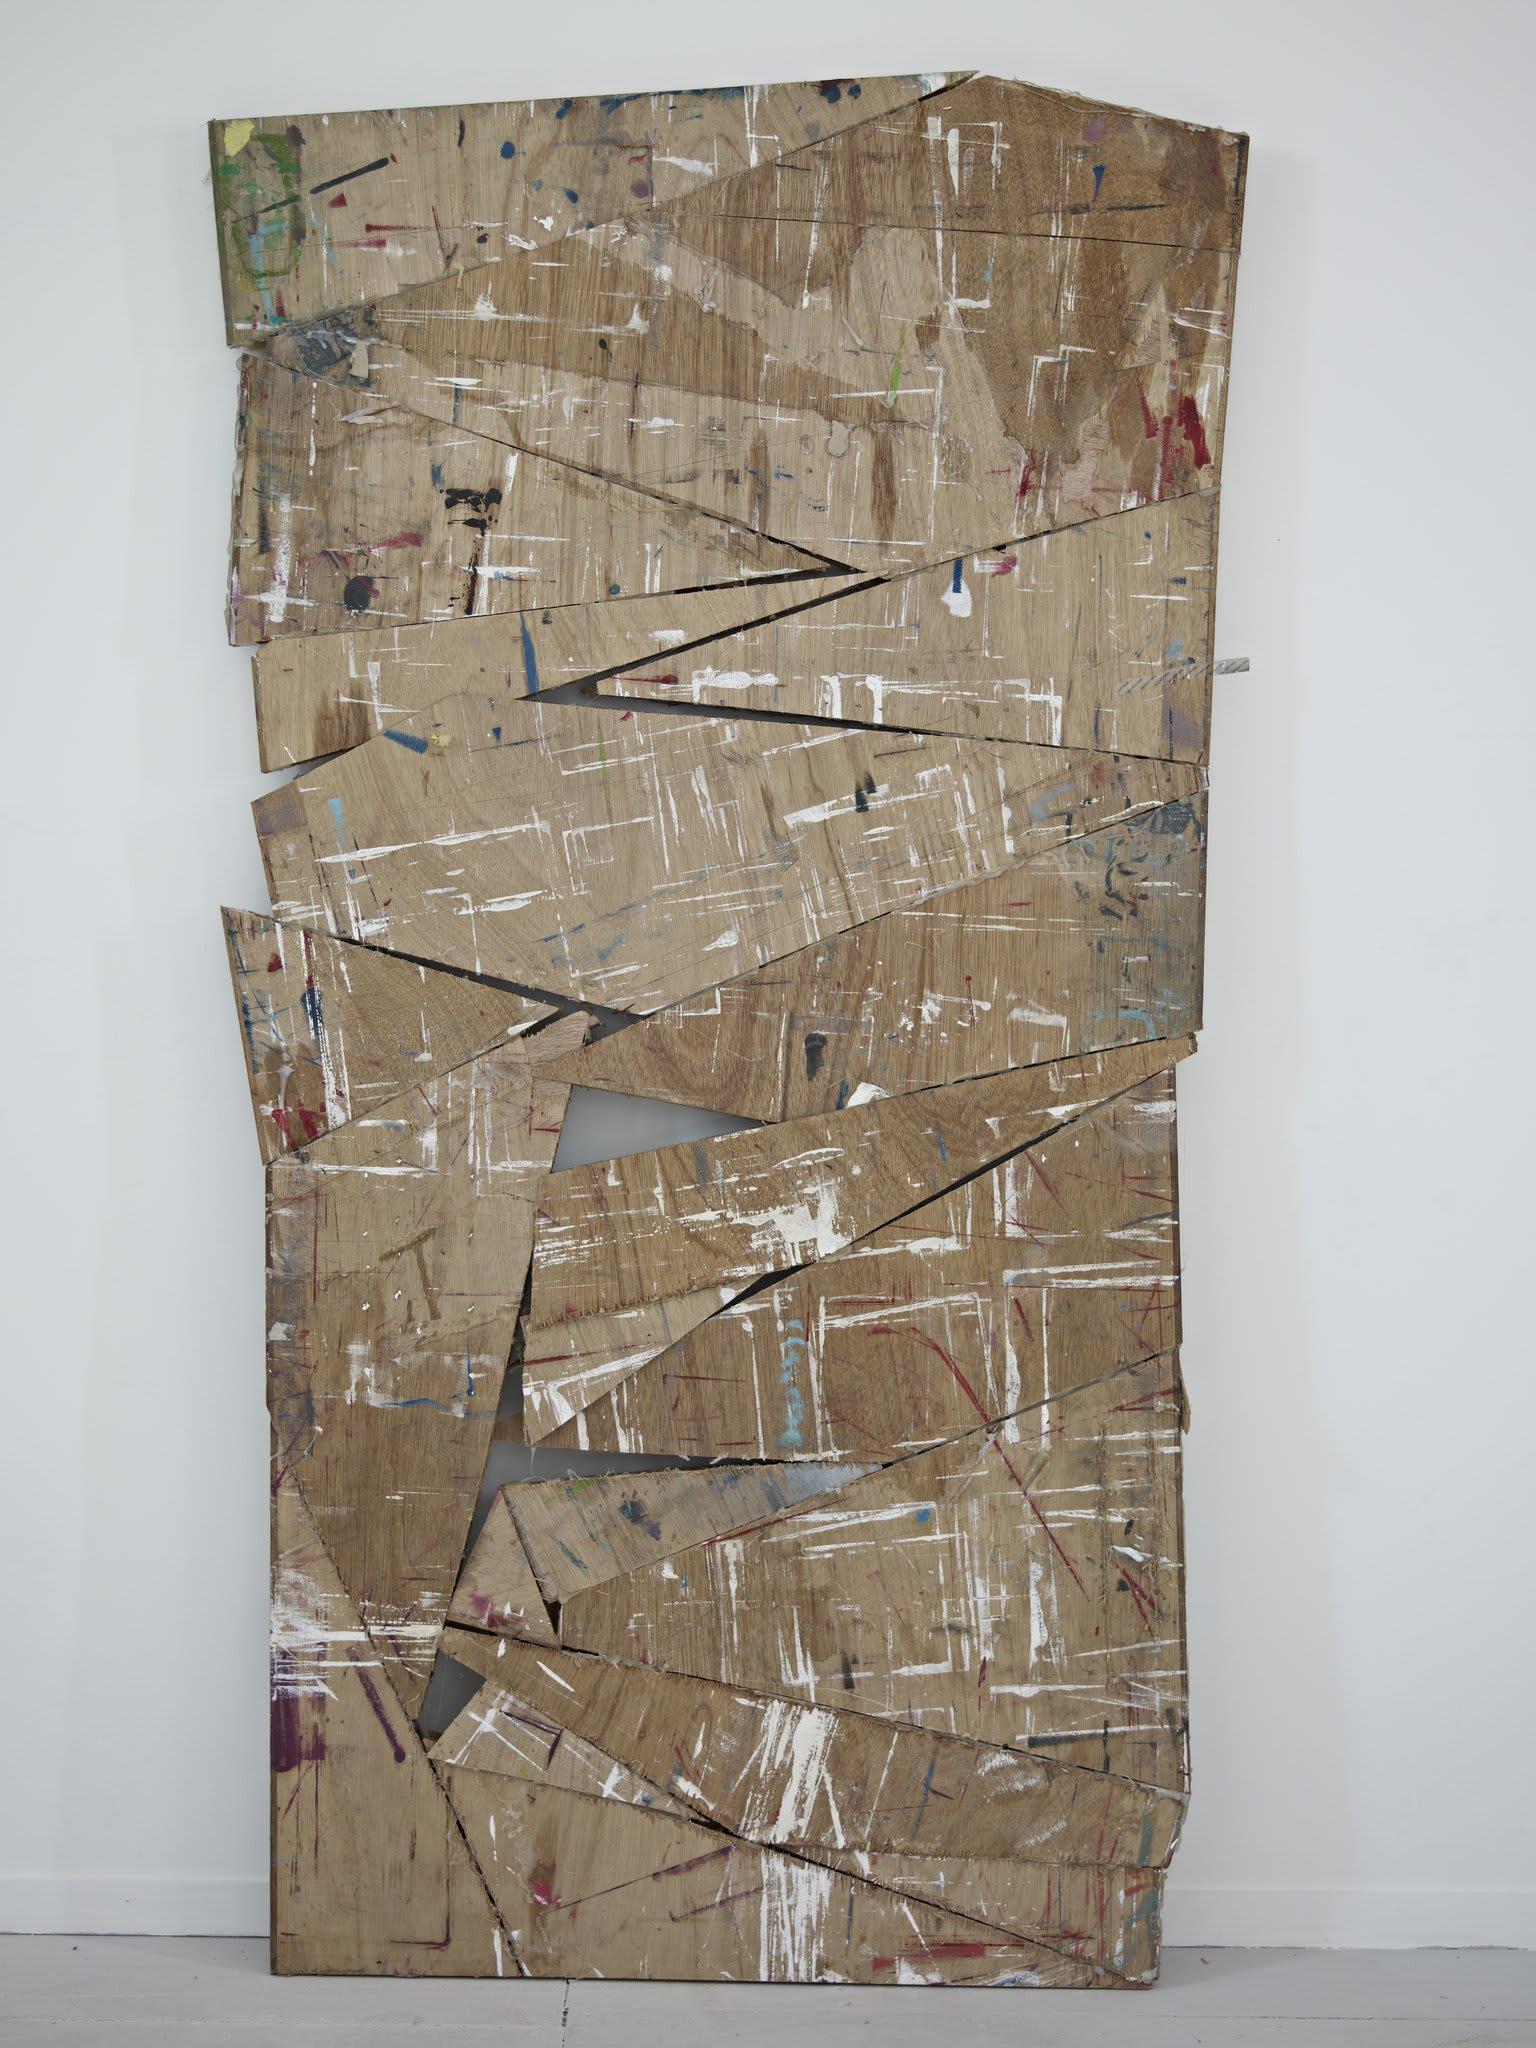 <span class=&#34;link fancybox-details-link&#34;><a href=&#34;/artists/16-paul-merrick/works/8111/&#34;>View Detail Page</a></span><div class=&#34;artist&#34;><strong>Paul Merrick</strong></div> <div class=&#34;title&#34;><em>Untitled (Studio Door)</em>, 2013</div> <div class=&#34;medium&#34;>Door, oil paint, turps, primer, glue</div> <div class=&#34;dimensions&#34;>164 x 84 cm<br />64 5/8 x 33 1/8 in</div><div class=&#34;copyright_line&#34;>Copyright The Artist</div>